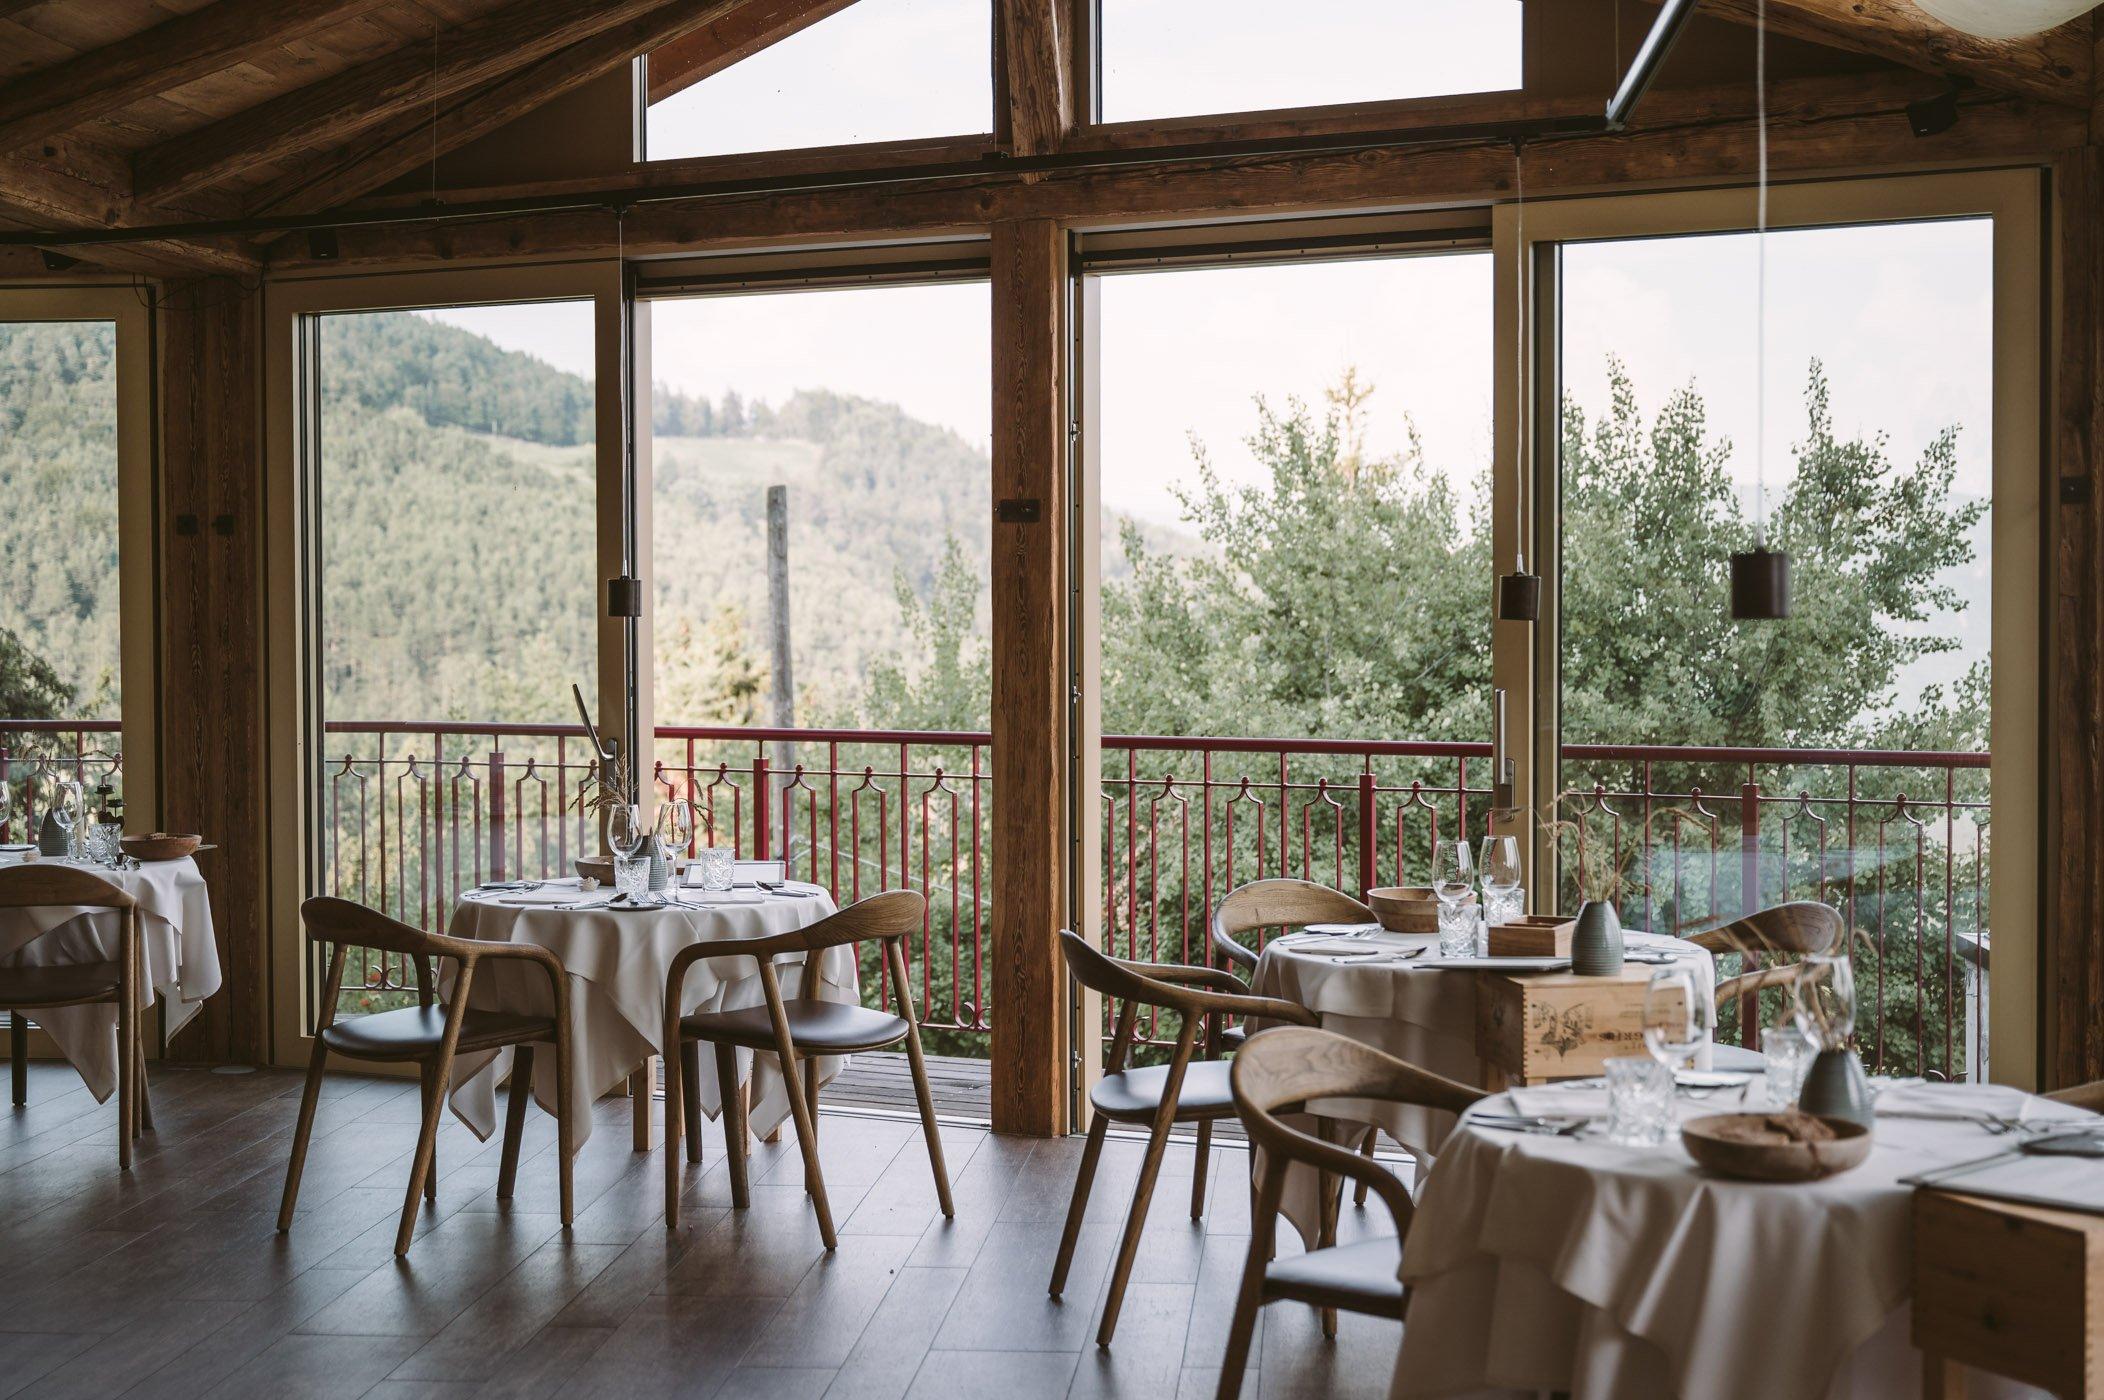 Restaurant at Hotel Saltus